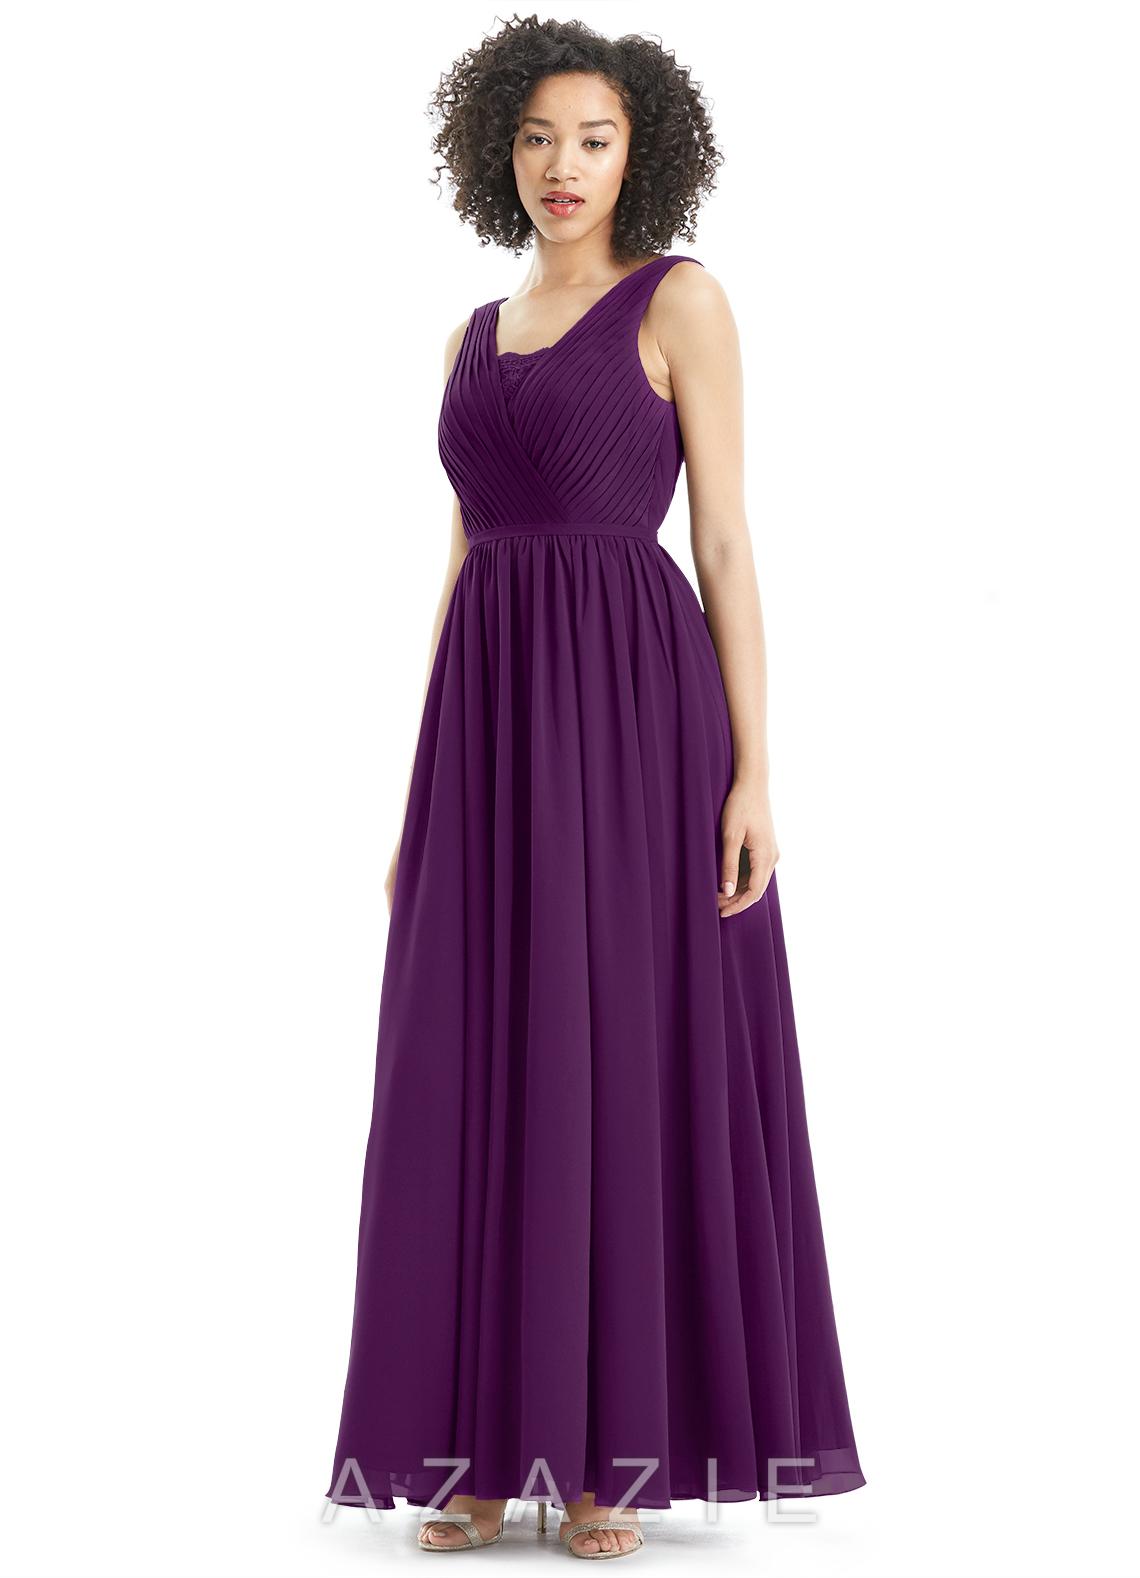 Azazie Ellen Bridesmaid Dress | Azazie